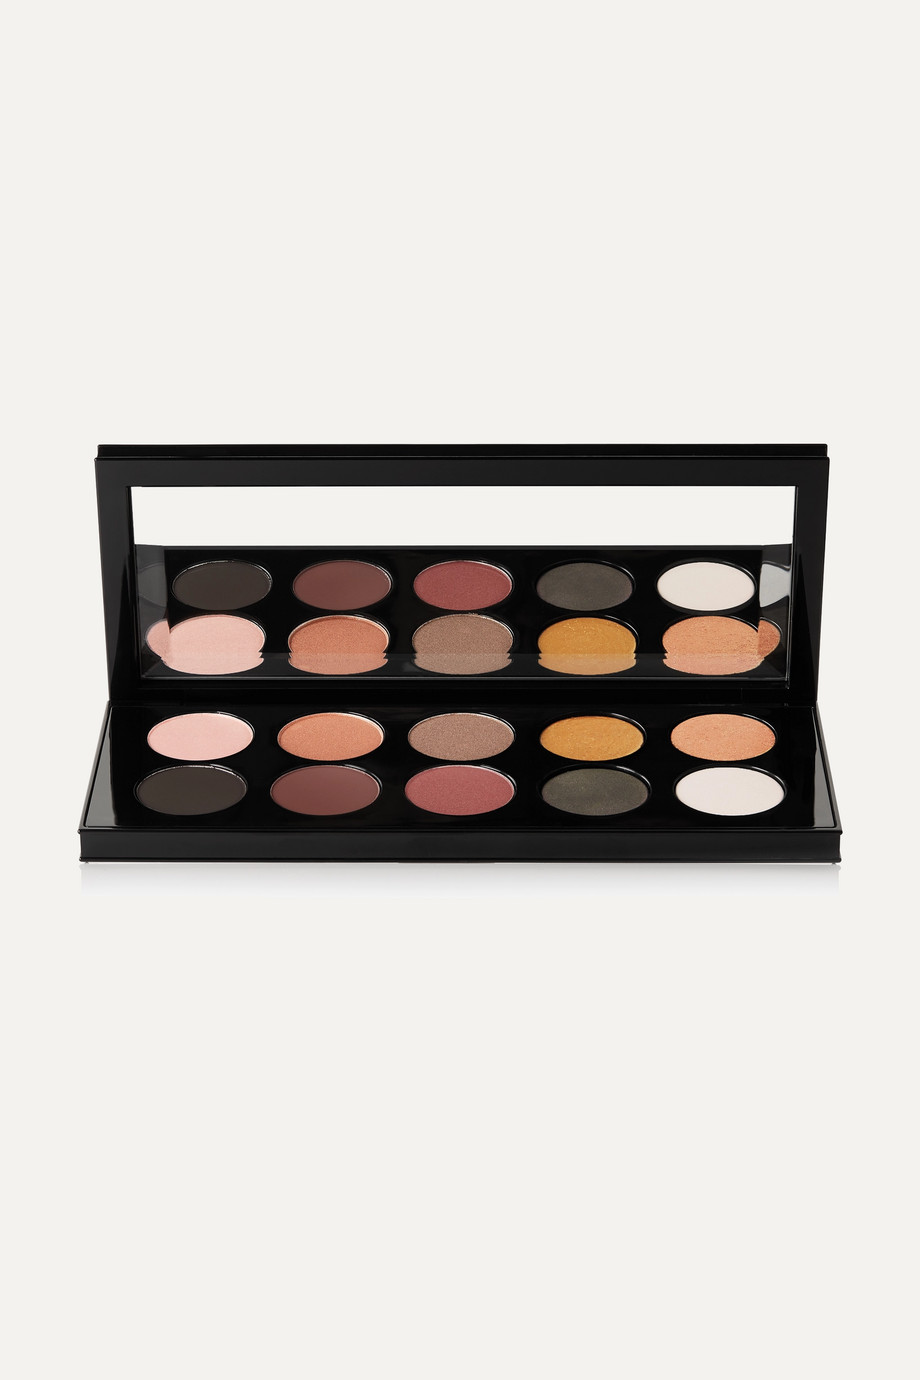 Pat McGrath Labs Mothership II Eyeshadow Palette - Sublime